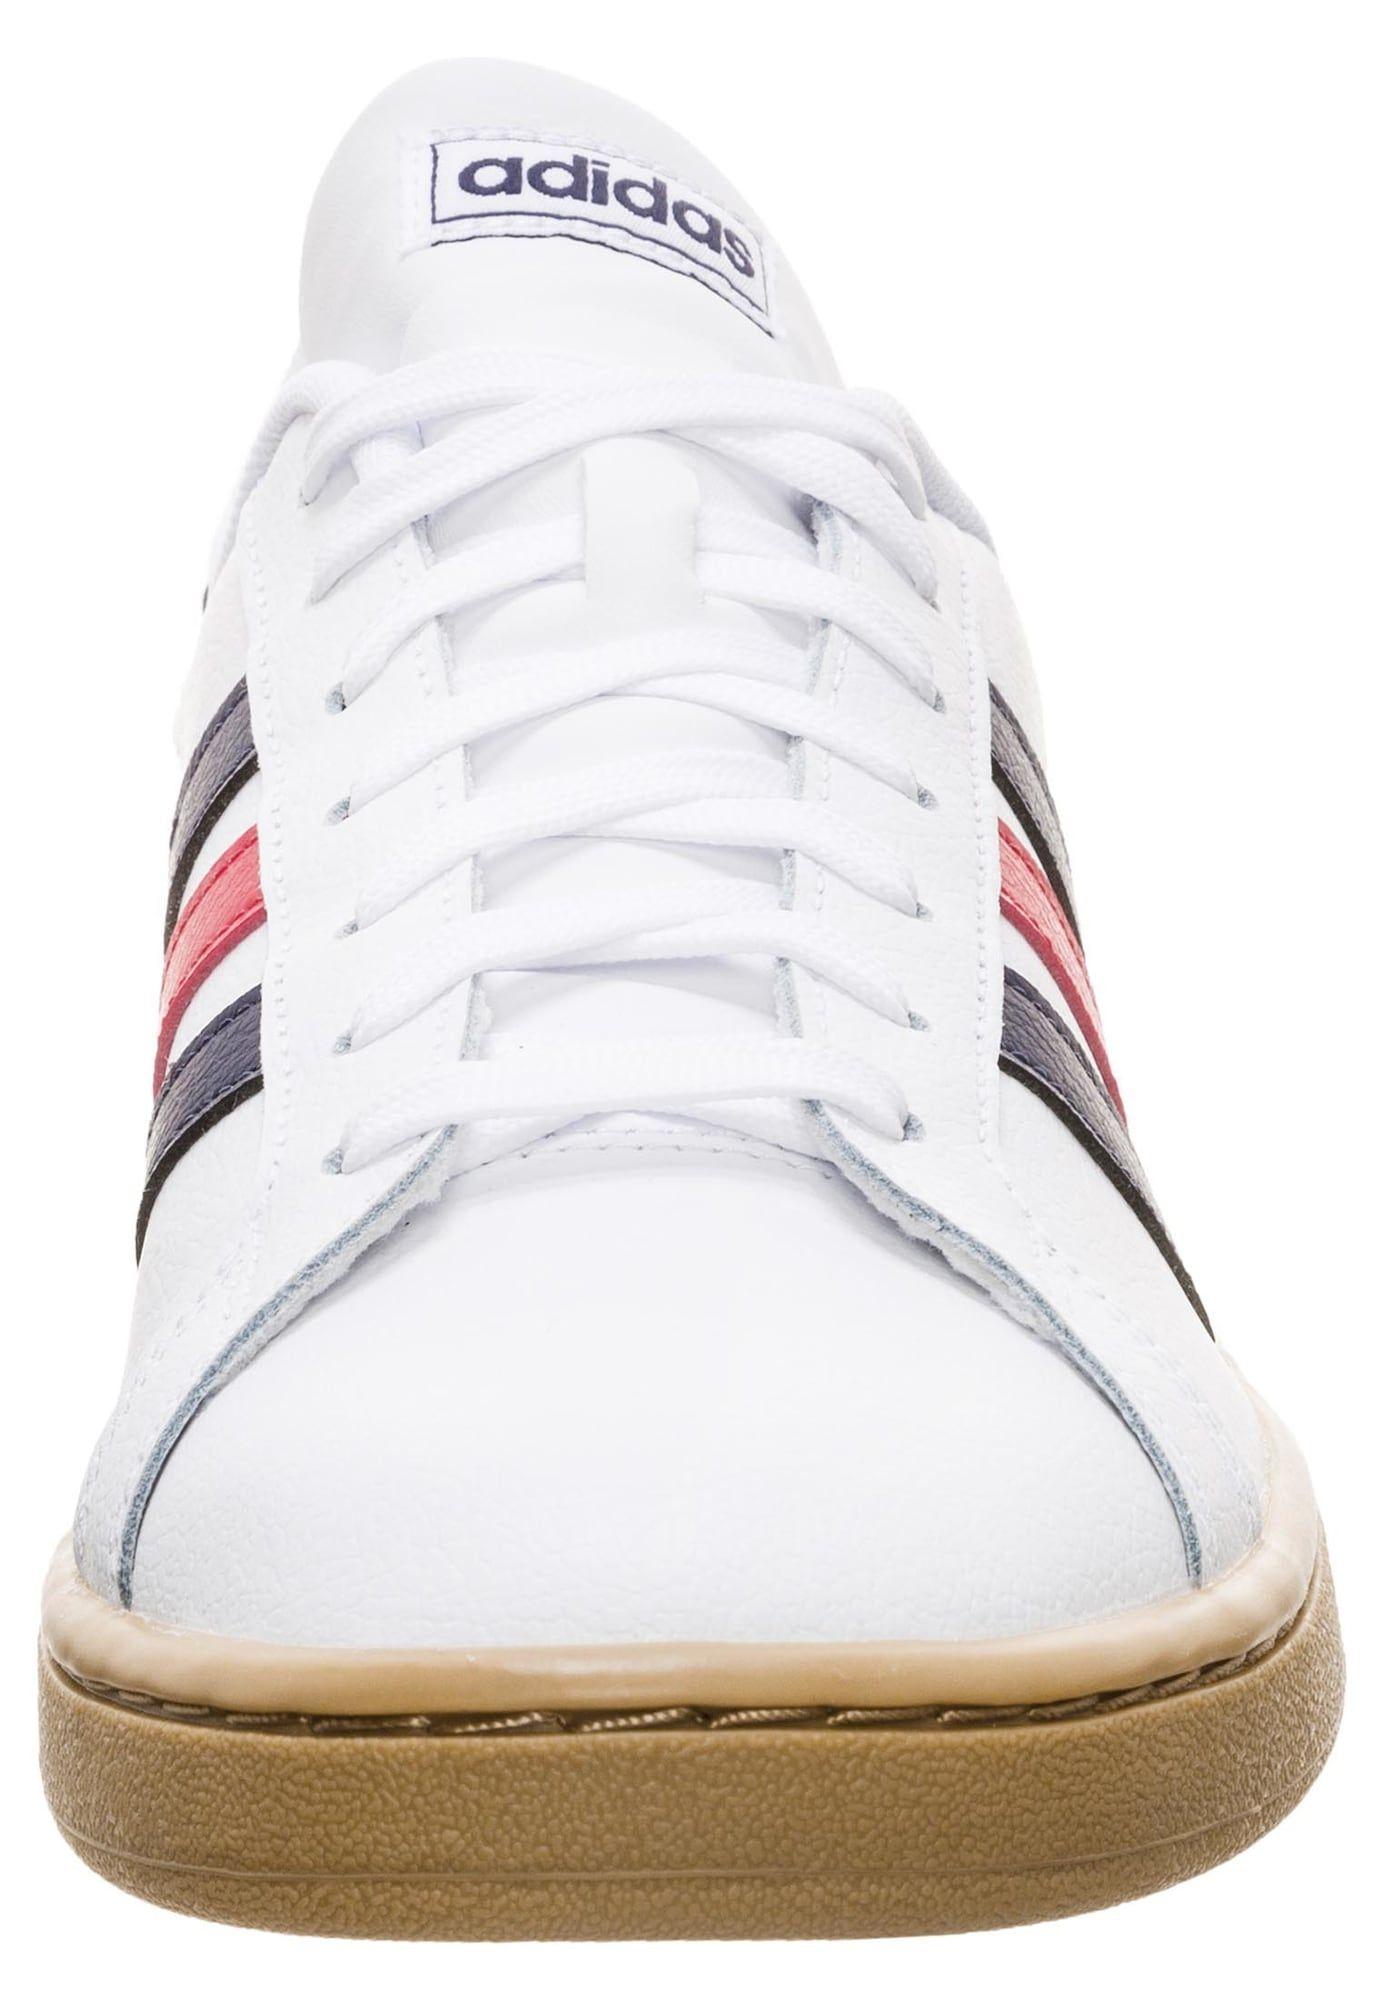 Adidas Performance Sneaker Grand Court Herren Nachtblau Rot Weiss Grosse 42 5 43 Sneaker Adidas Adidas Performance